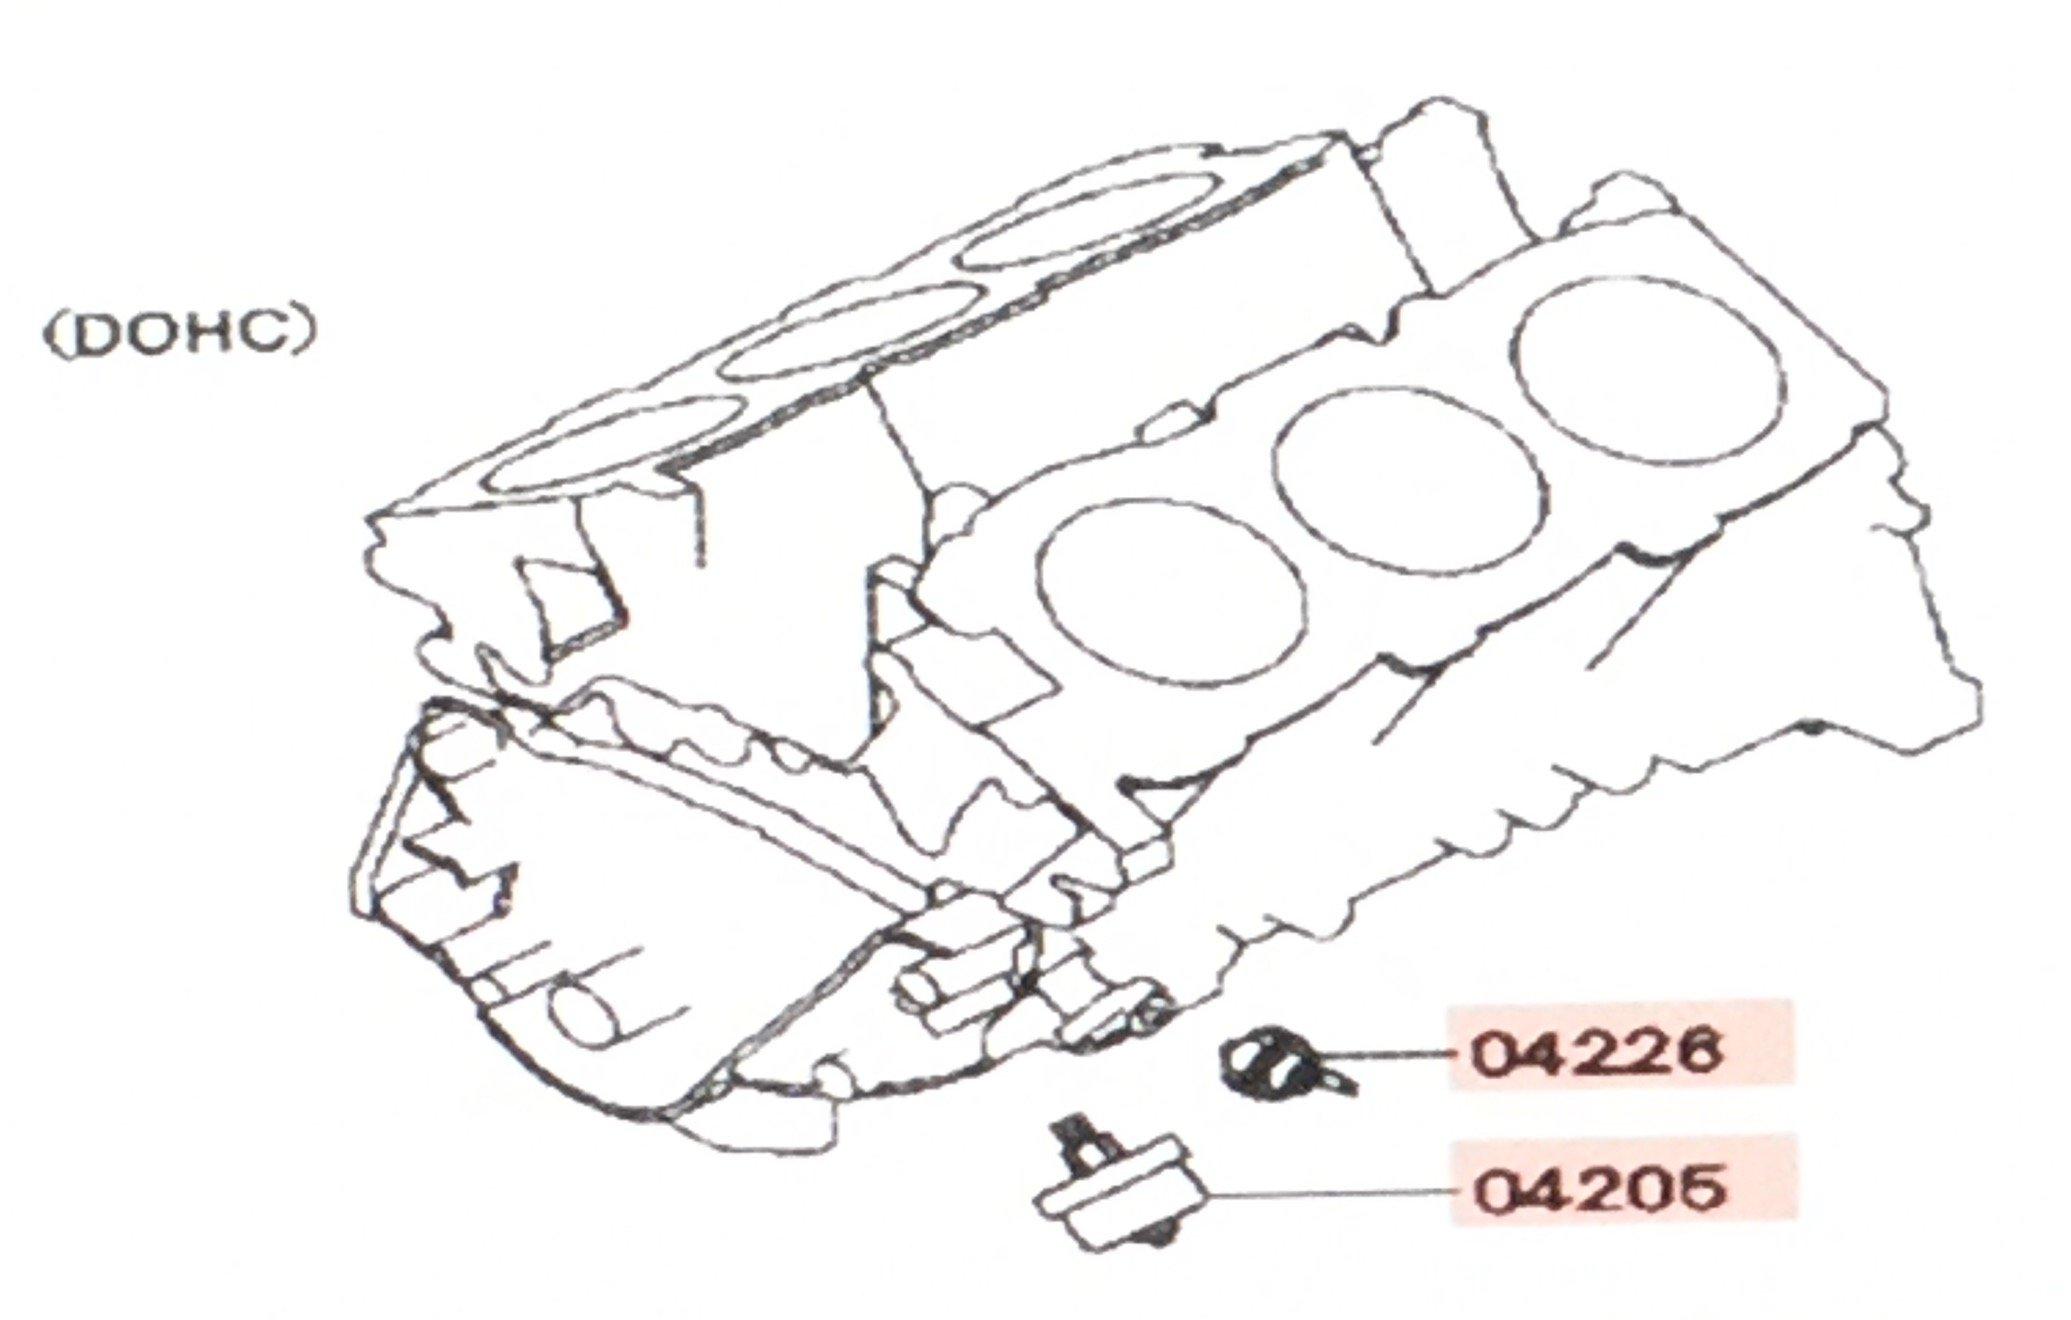 Mitsubishi Genuine Oil Pressure Sensor Set for Guage and Warning Light 1258A002 & MD133273 3000GT